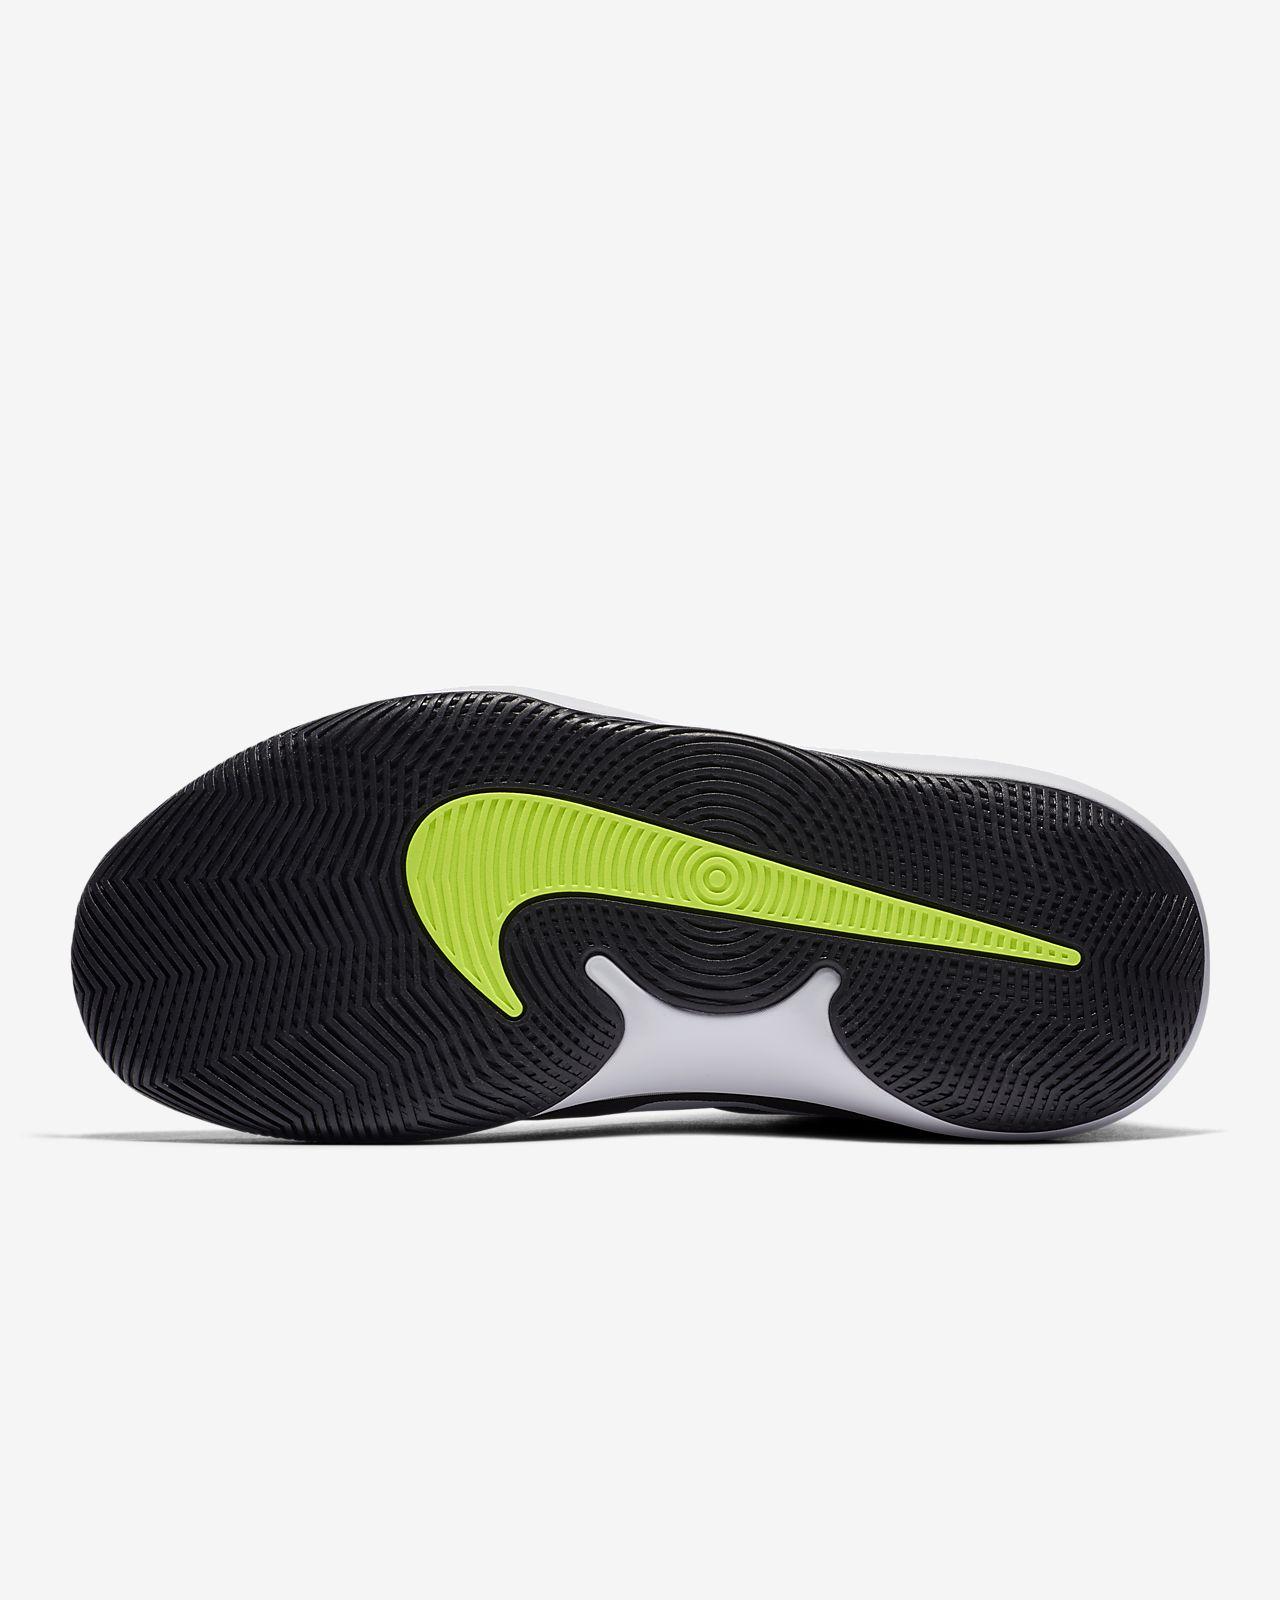 9419865070c3d Nike Air Precision II FlyEase 4E Men's Basketball Shoe. Nike.com